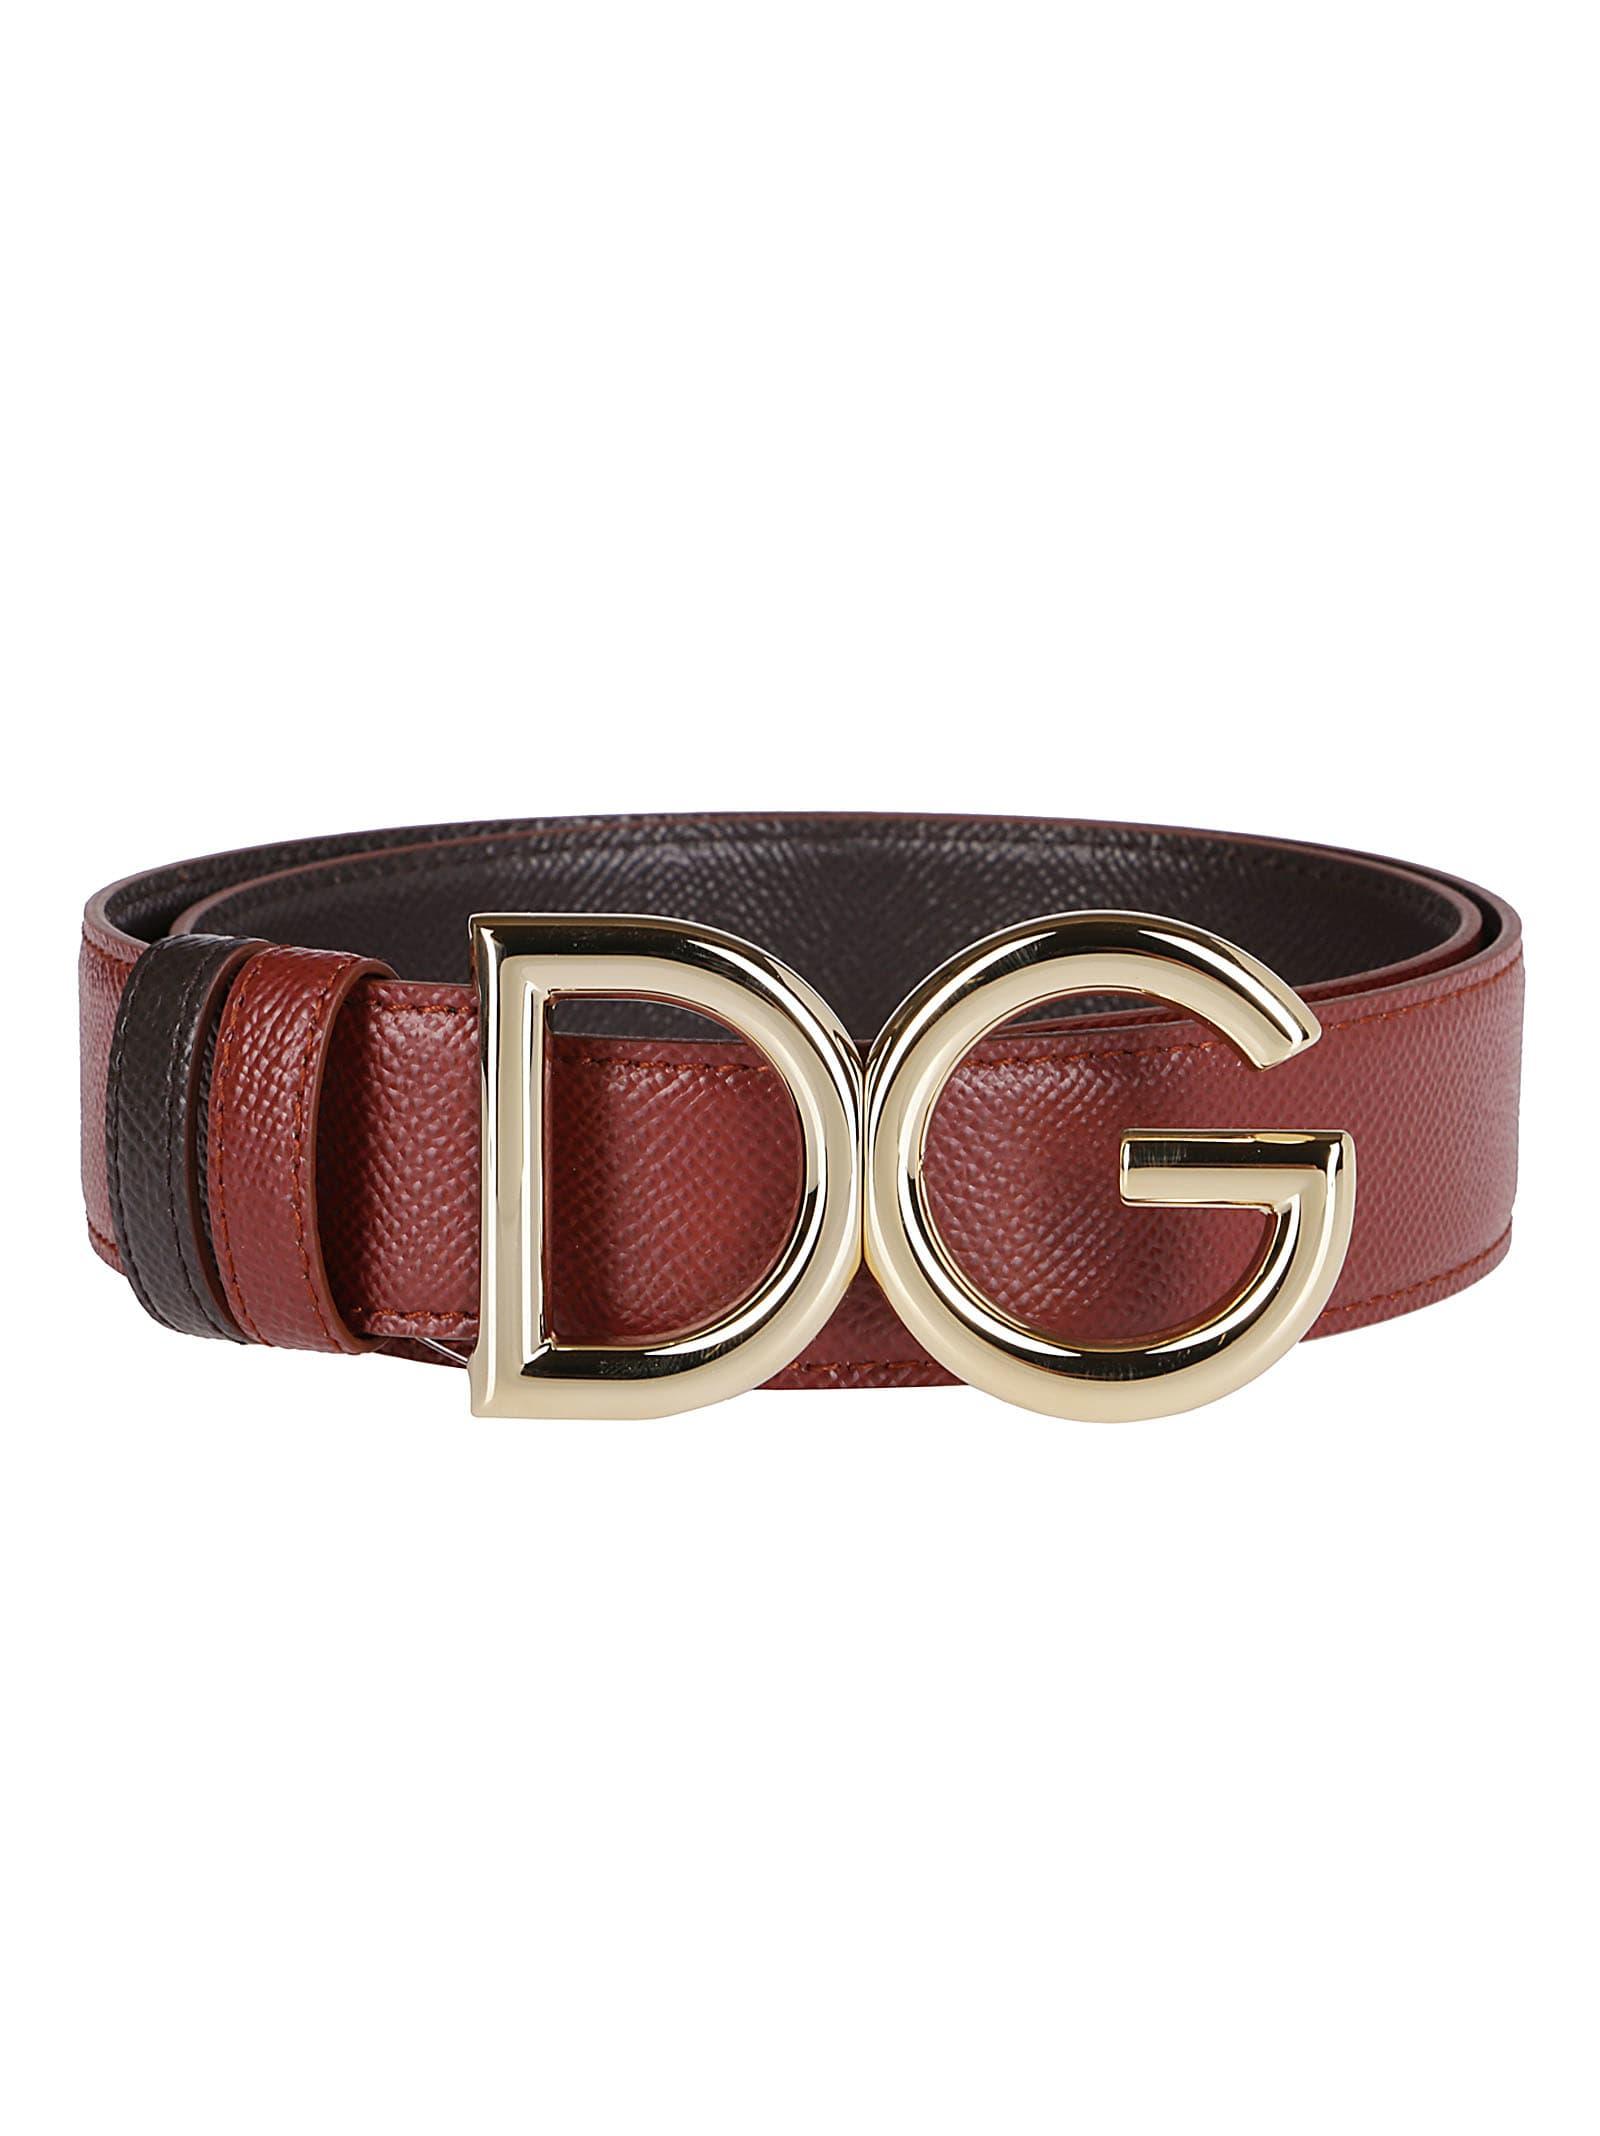 Dolce & Gabbana Belts COGNAC BROWN LEATHER BELT